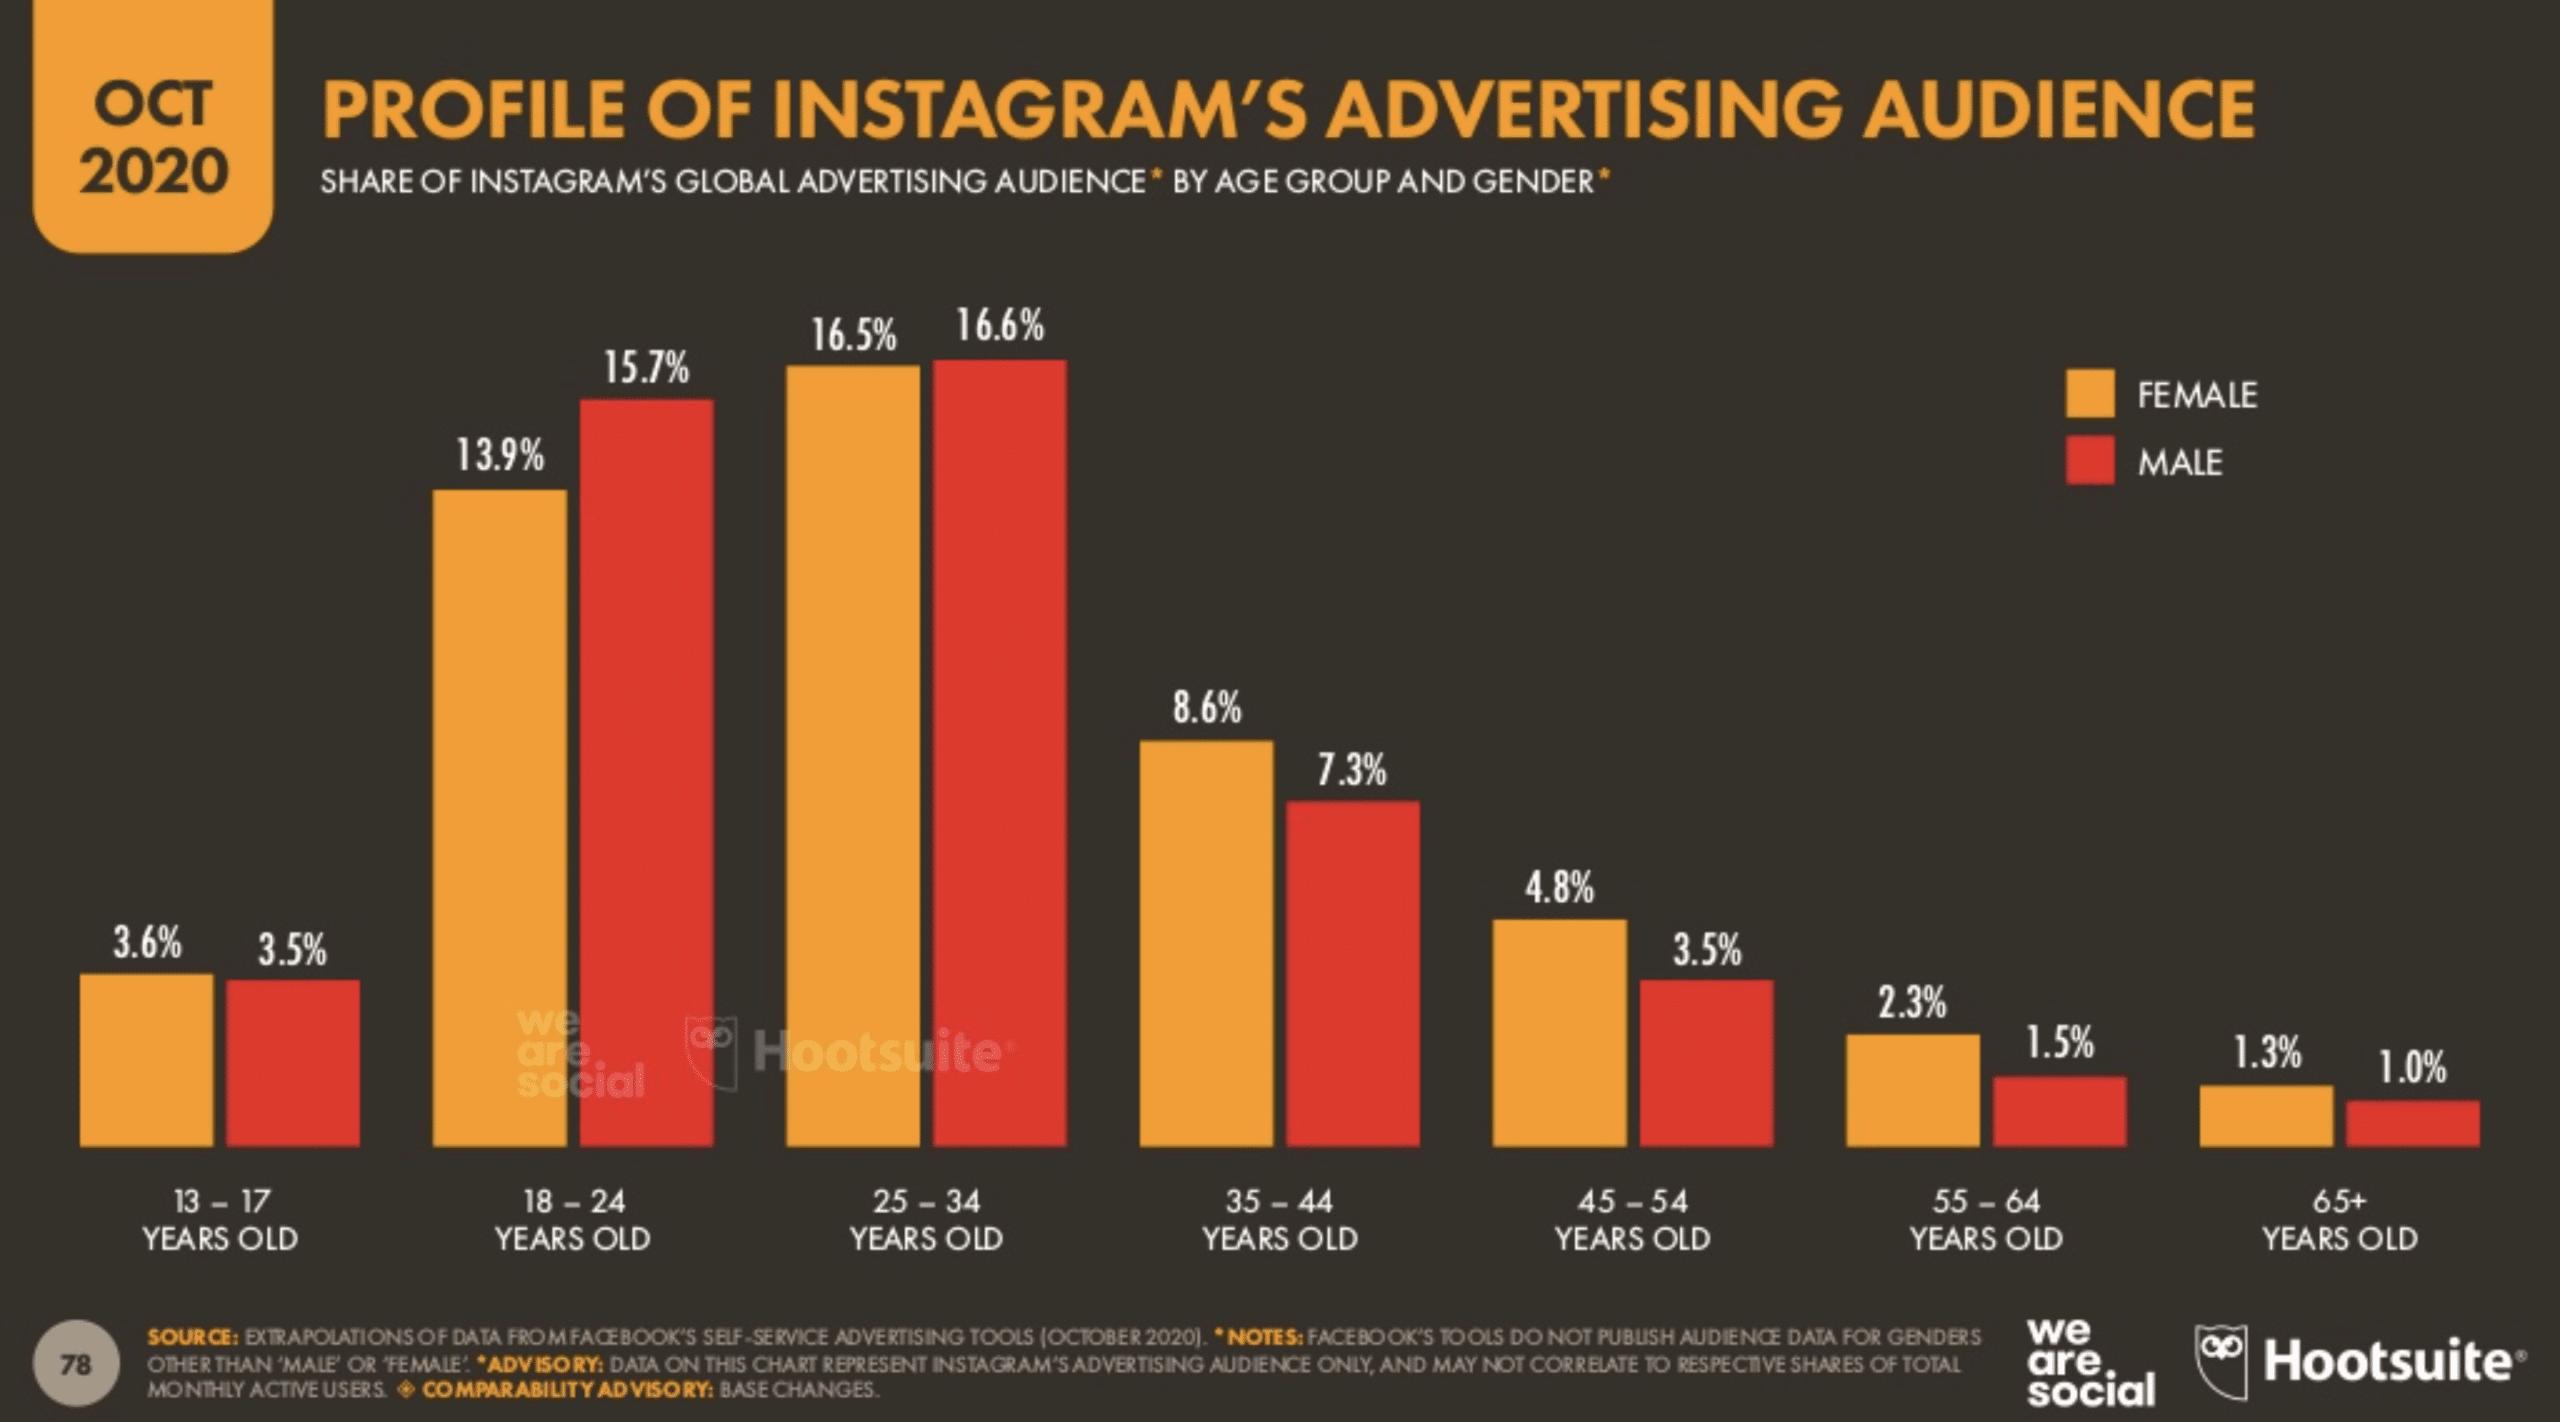 Profile of Instagram's advertising audience